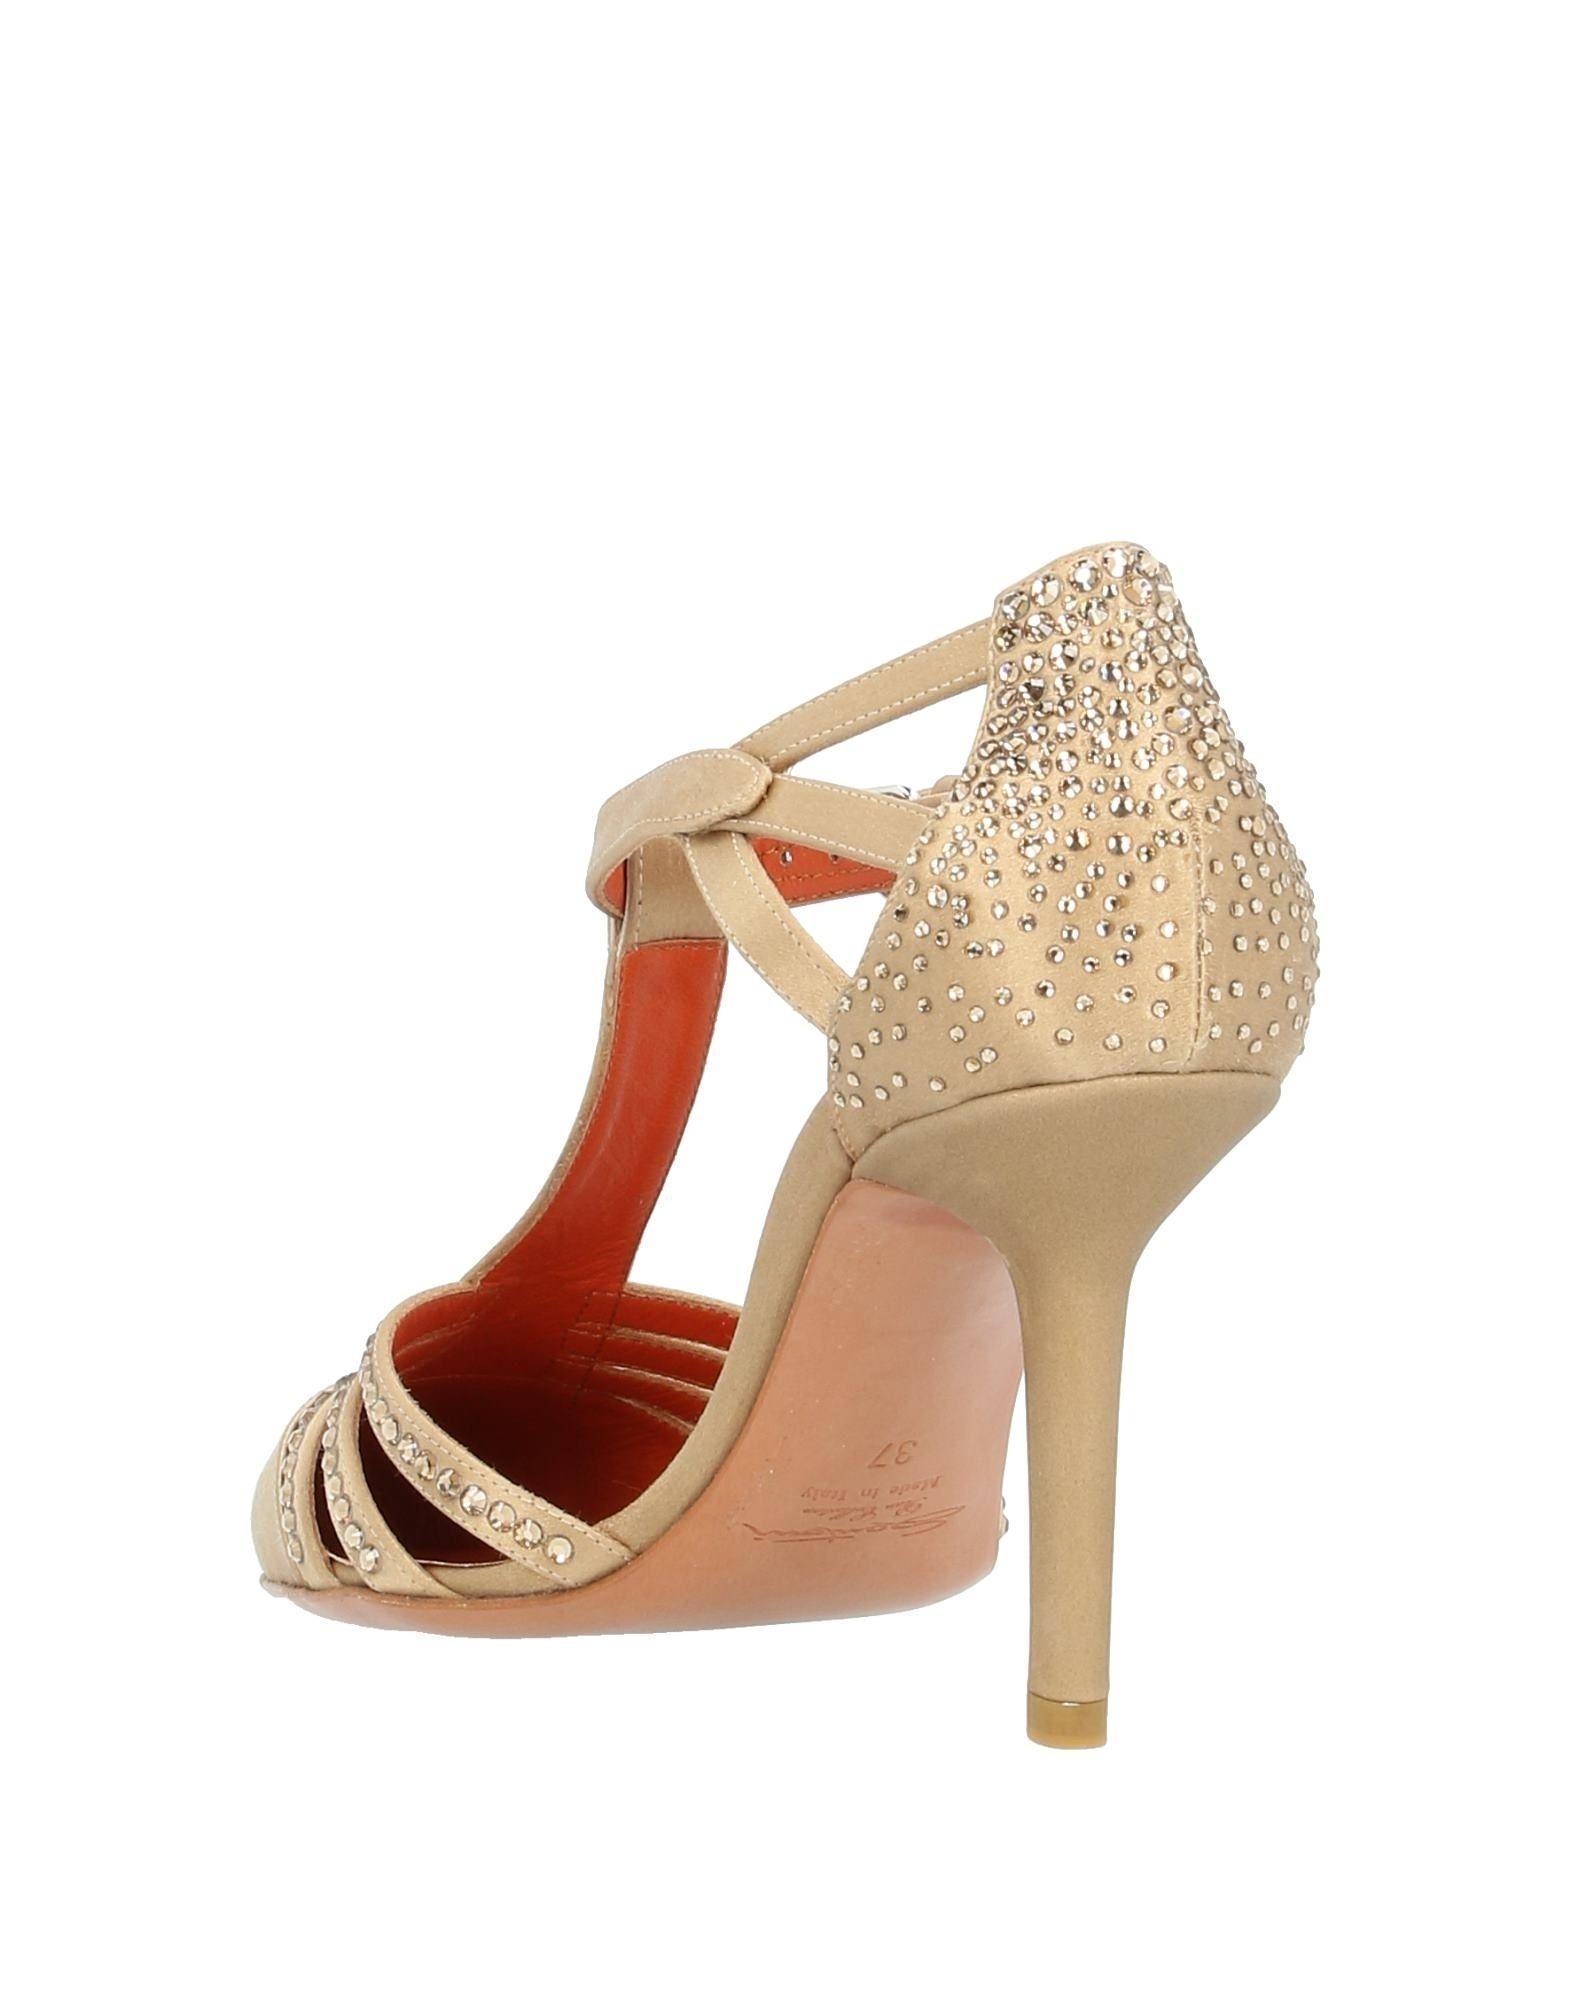 Zapatos de salón Santoni de Raso de color Neutro